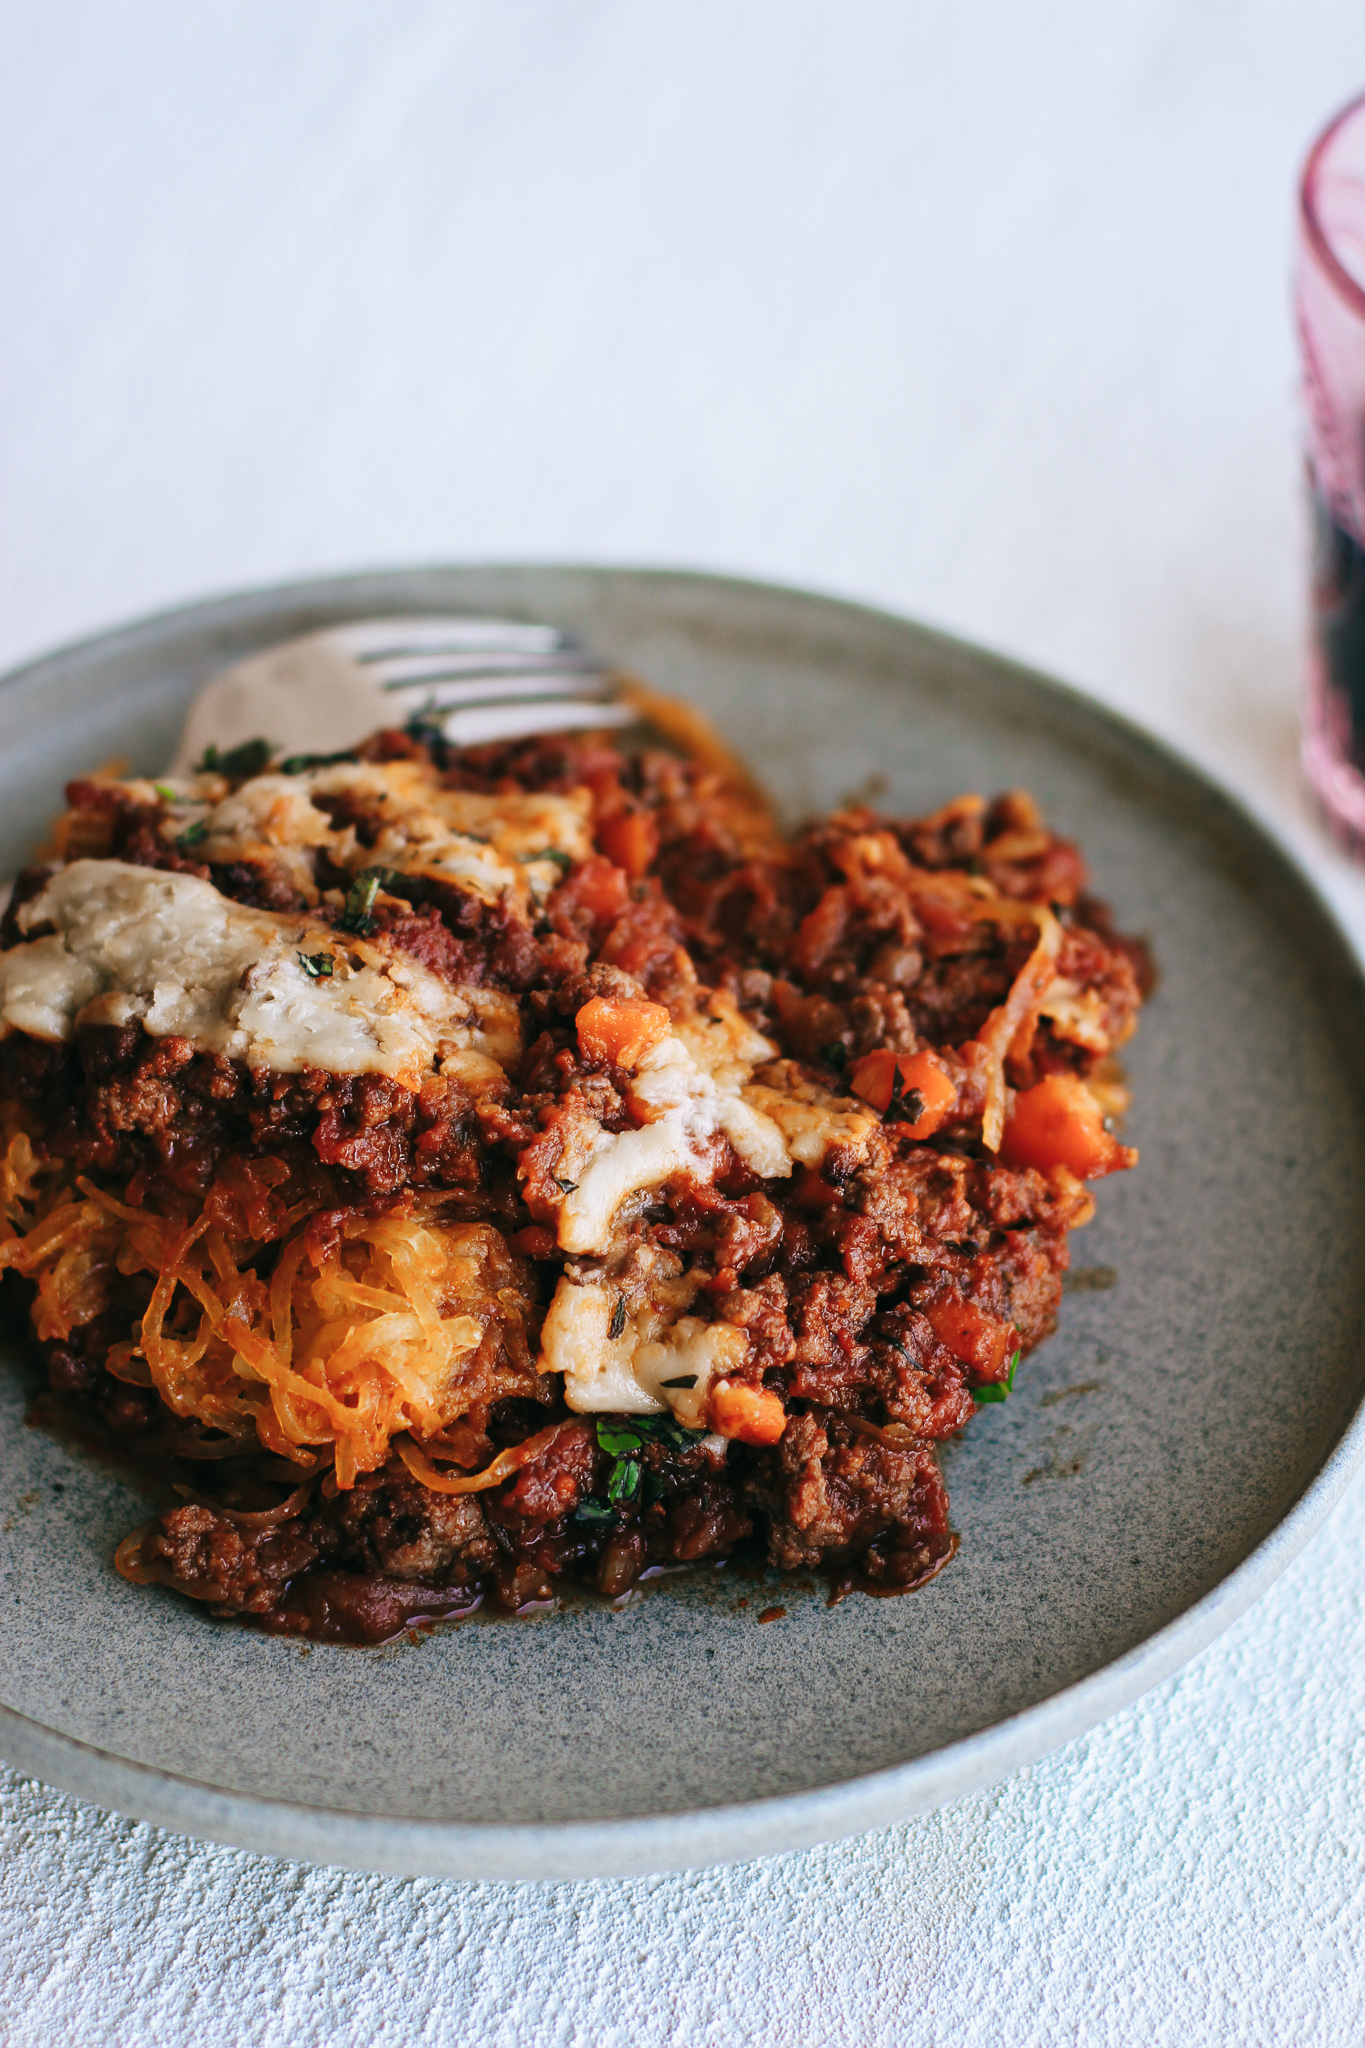 simple red wine meat sauce spaghetti squash bake (dairy free, gluten free).